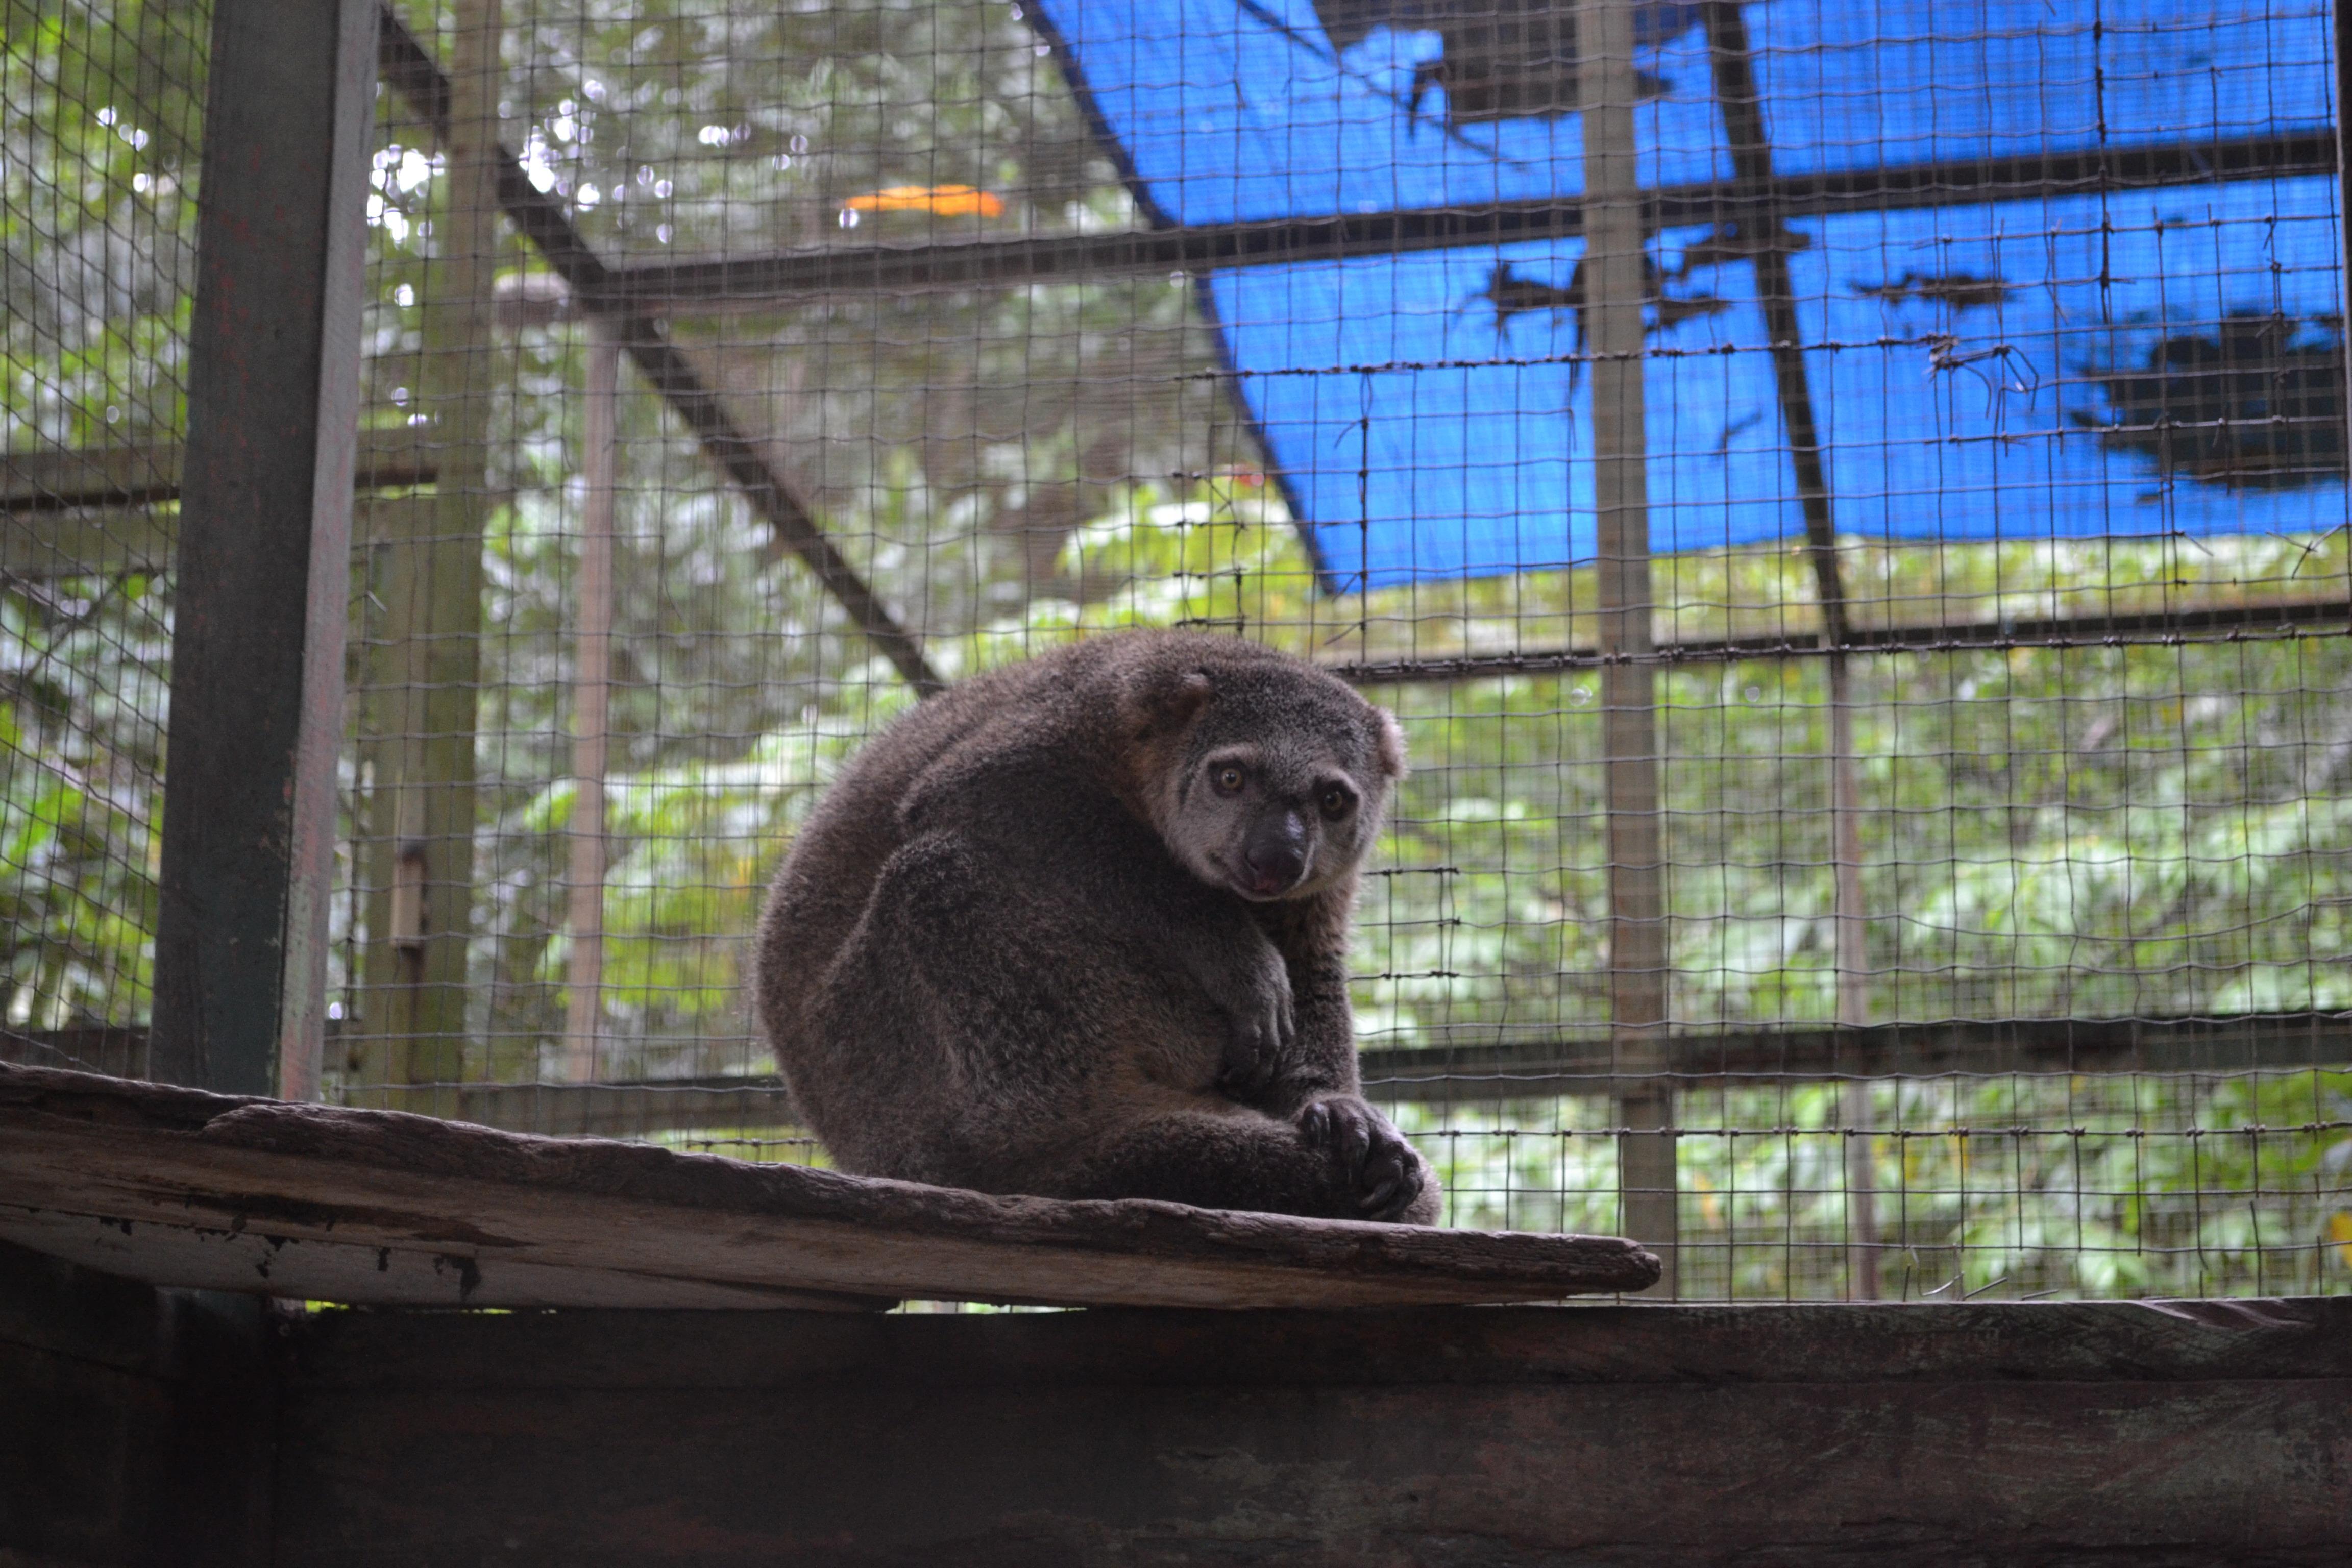 Kuse Mammal, Animal, Conservation, Mammal, Zoo, HQ Photo